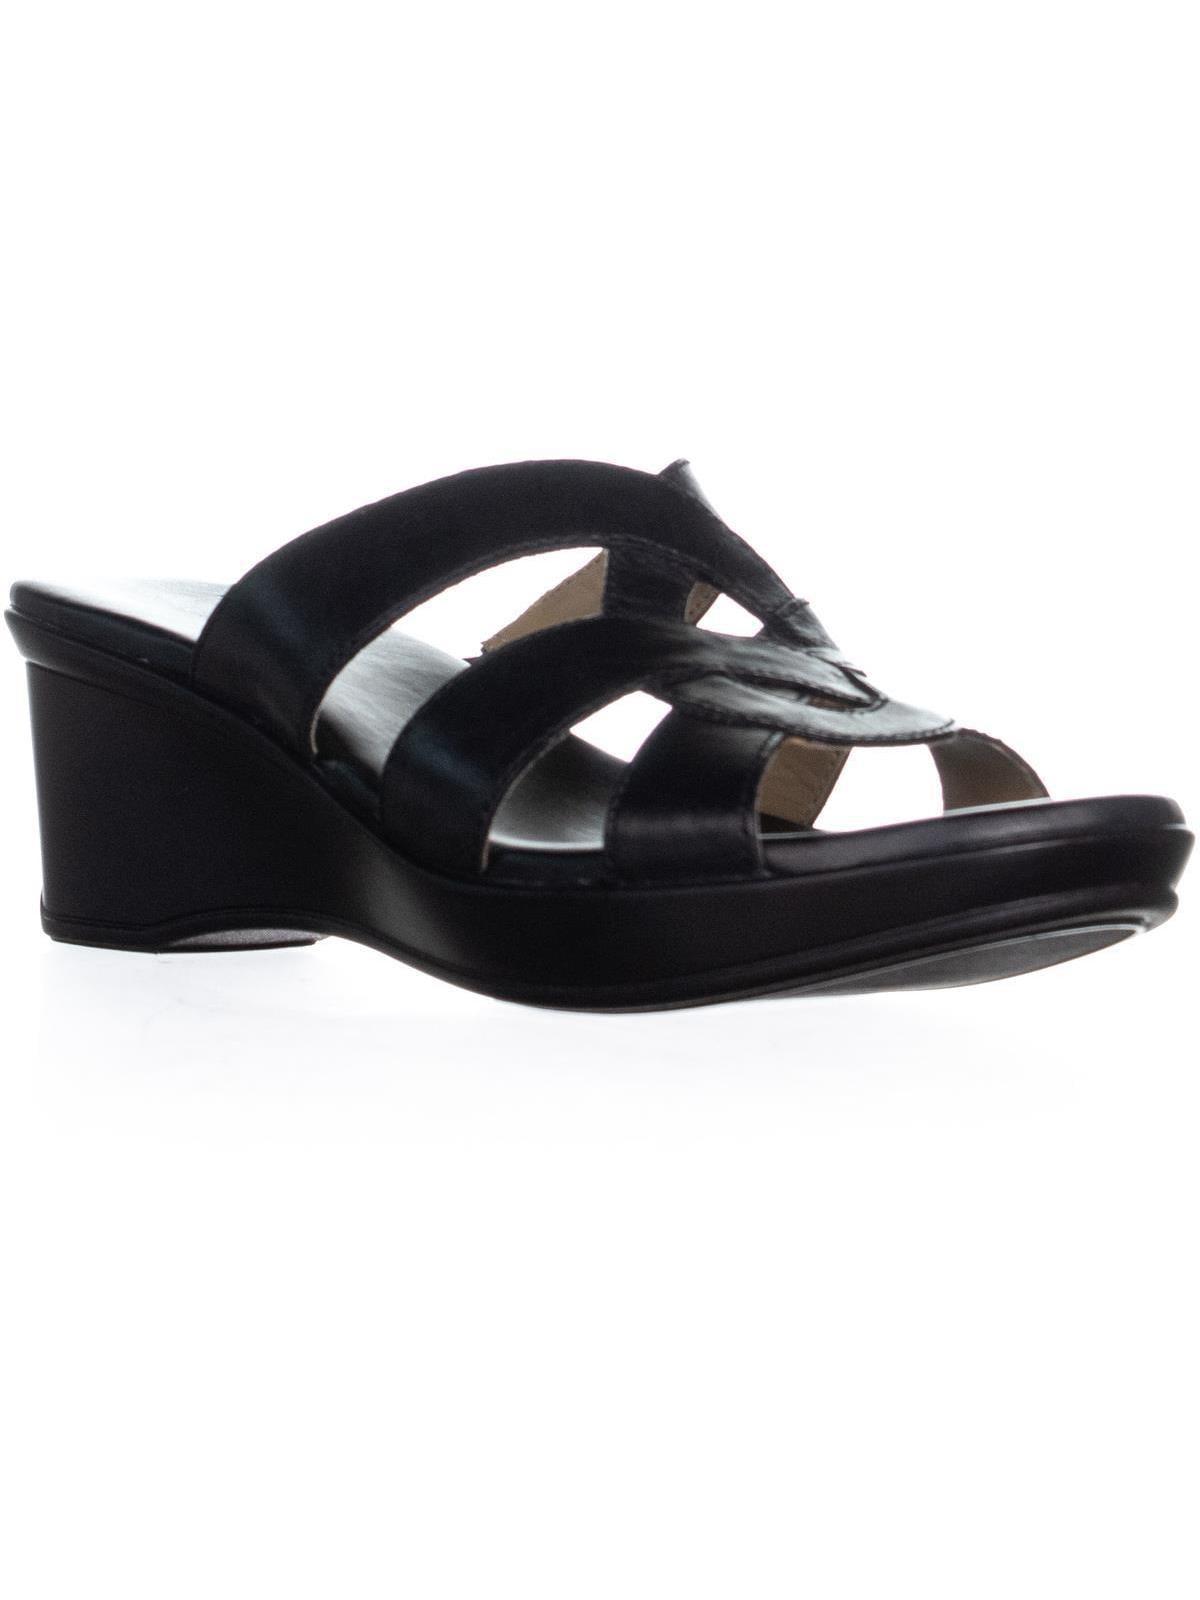 Womens Naturalizer Violet Wedge Sandals, Black Leather, 9.5 US   39.5 EU by Naturalizer